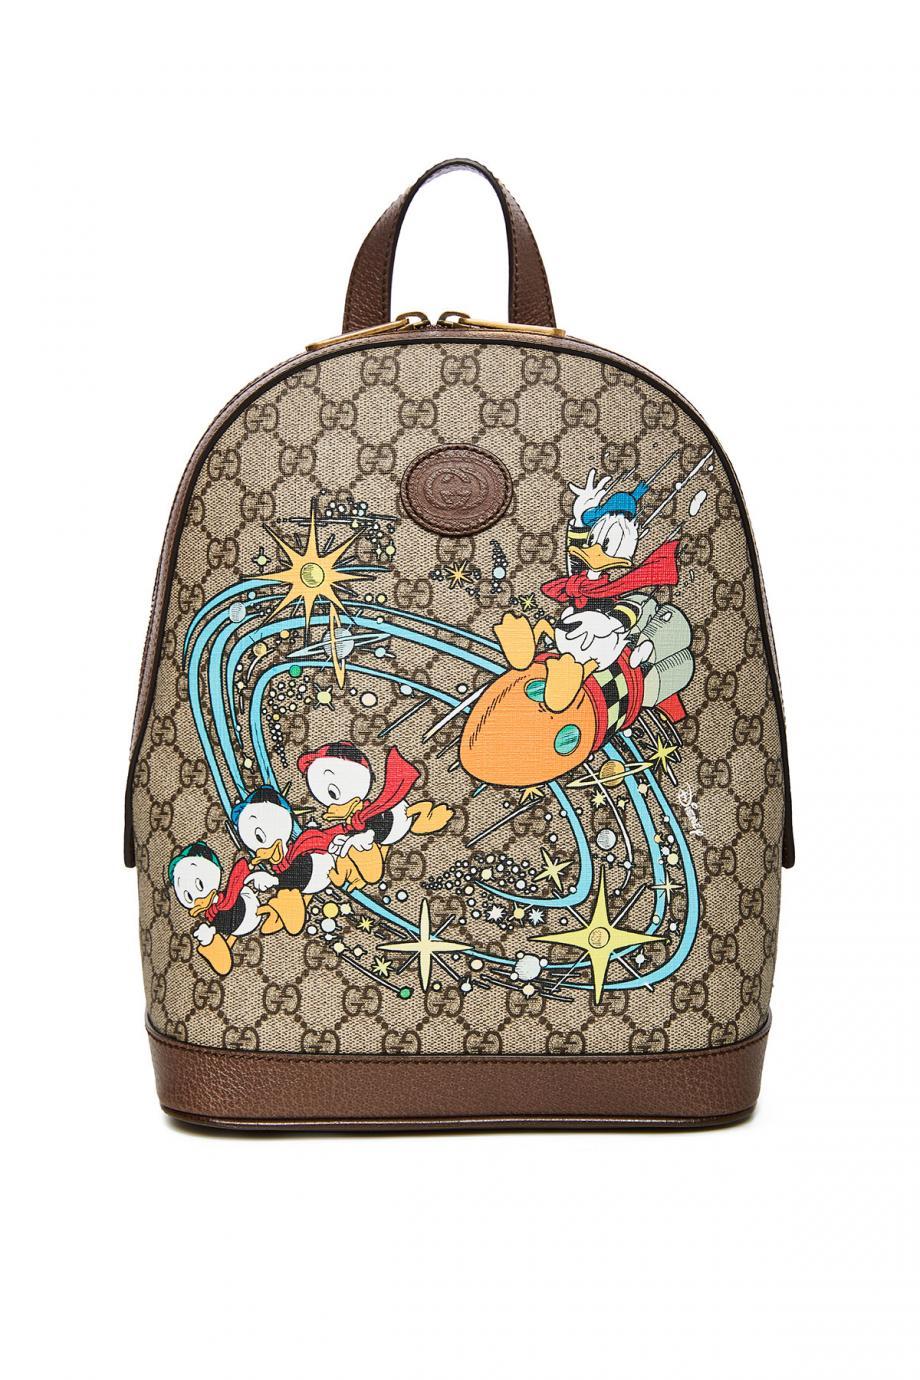 x Disney printed coated-canvas bag